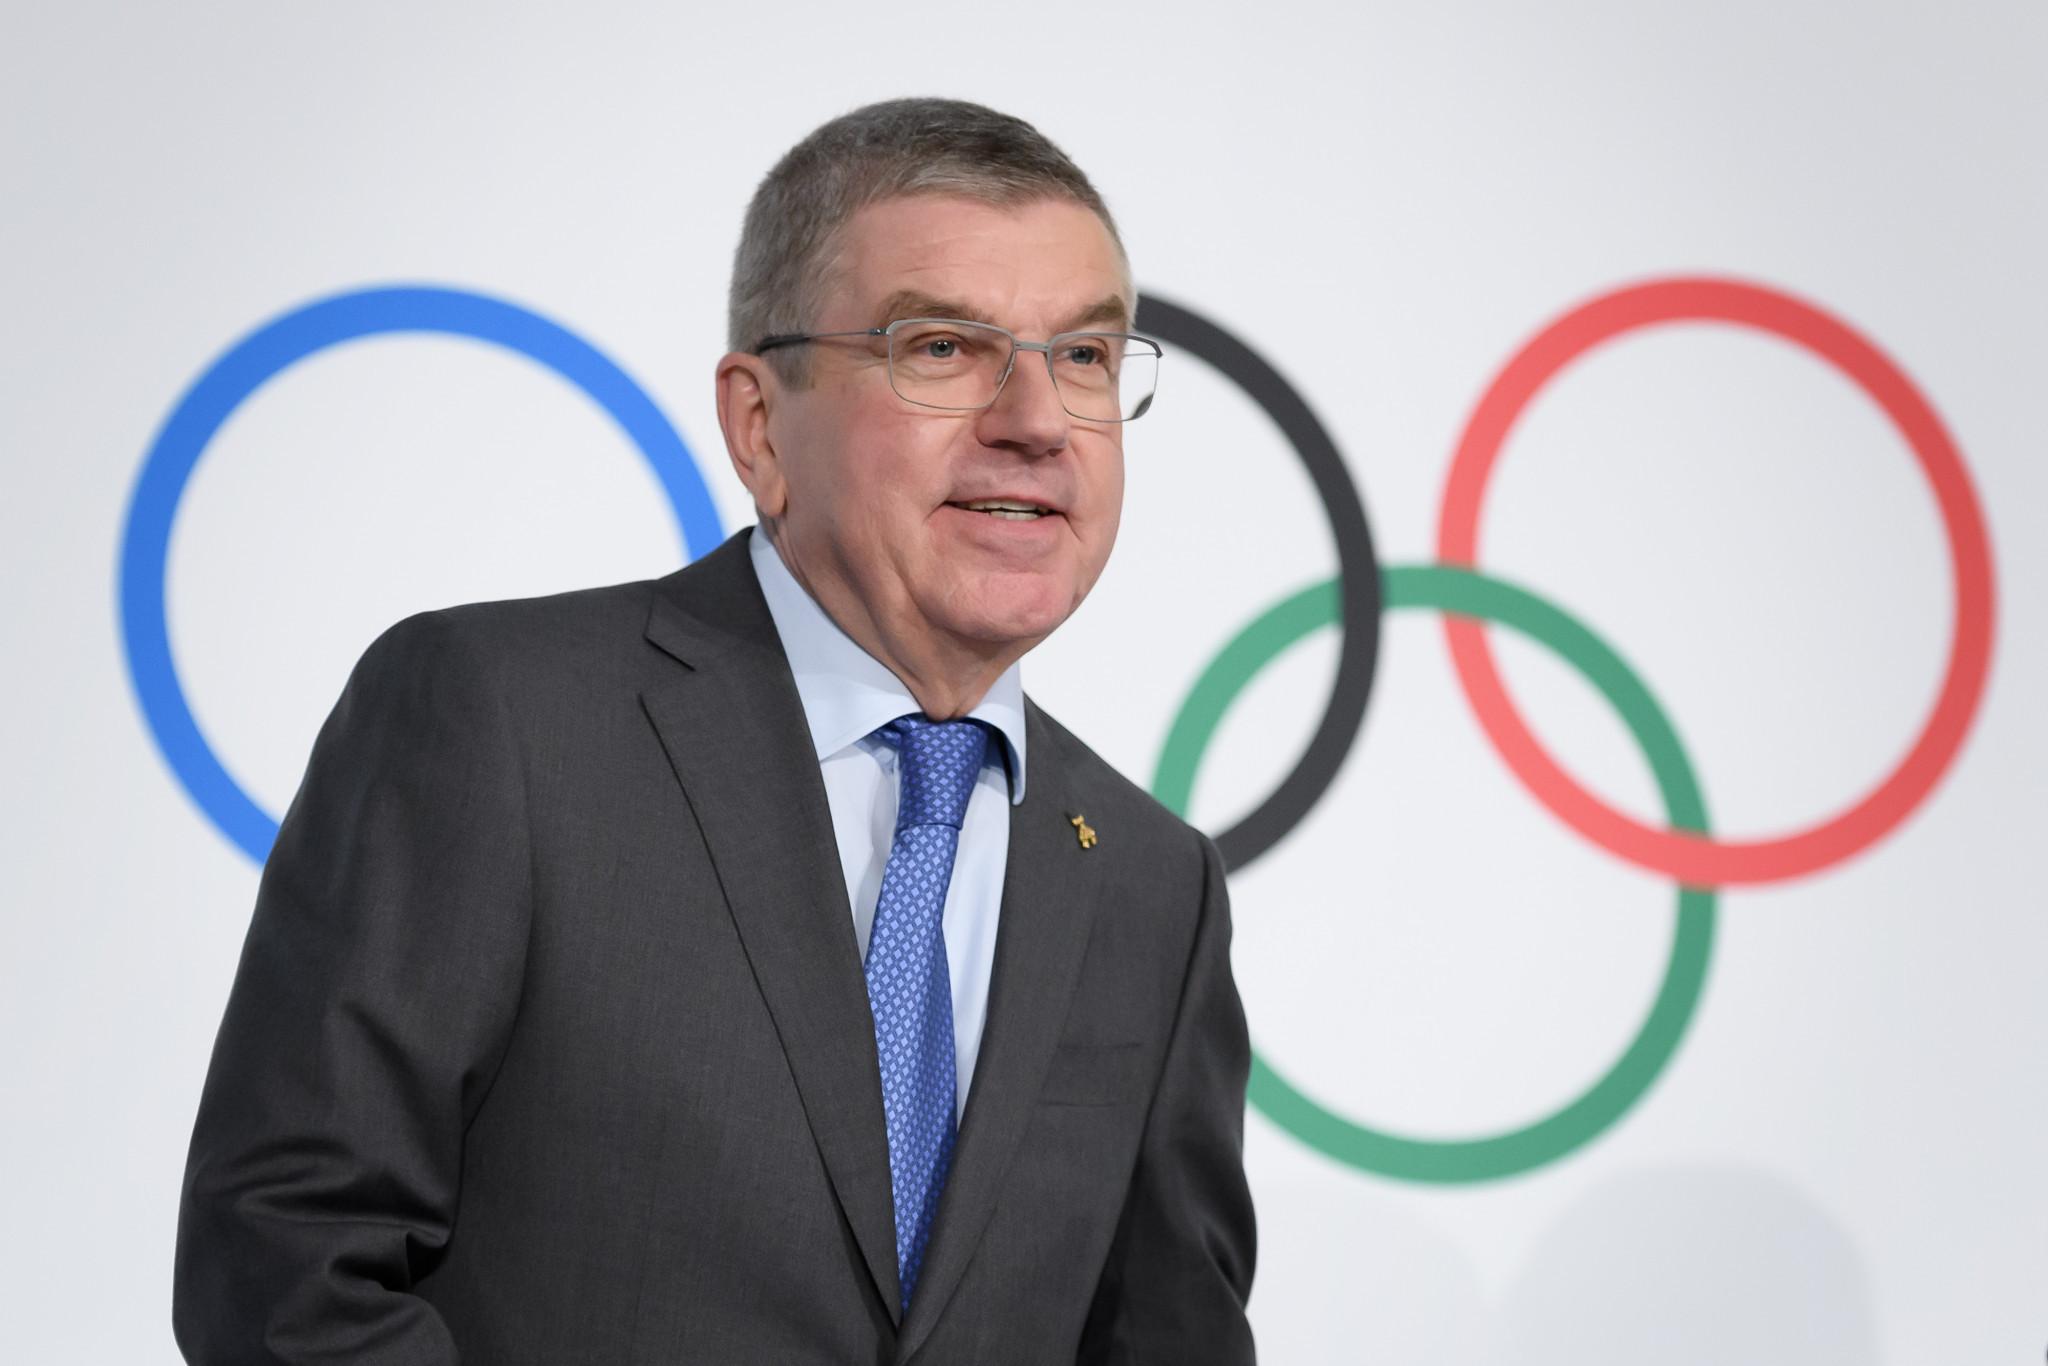 IOC confident Tokyo 2020 will achieve carbon-neutral aim